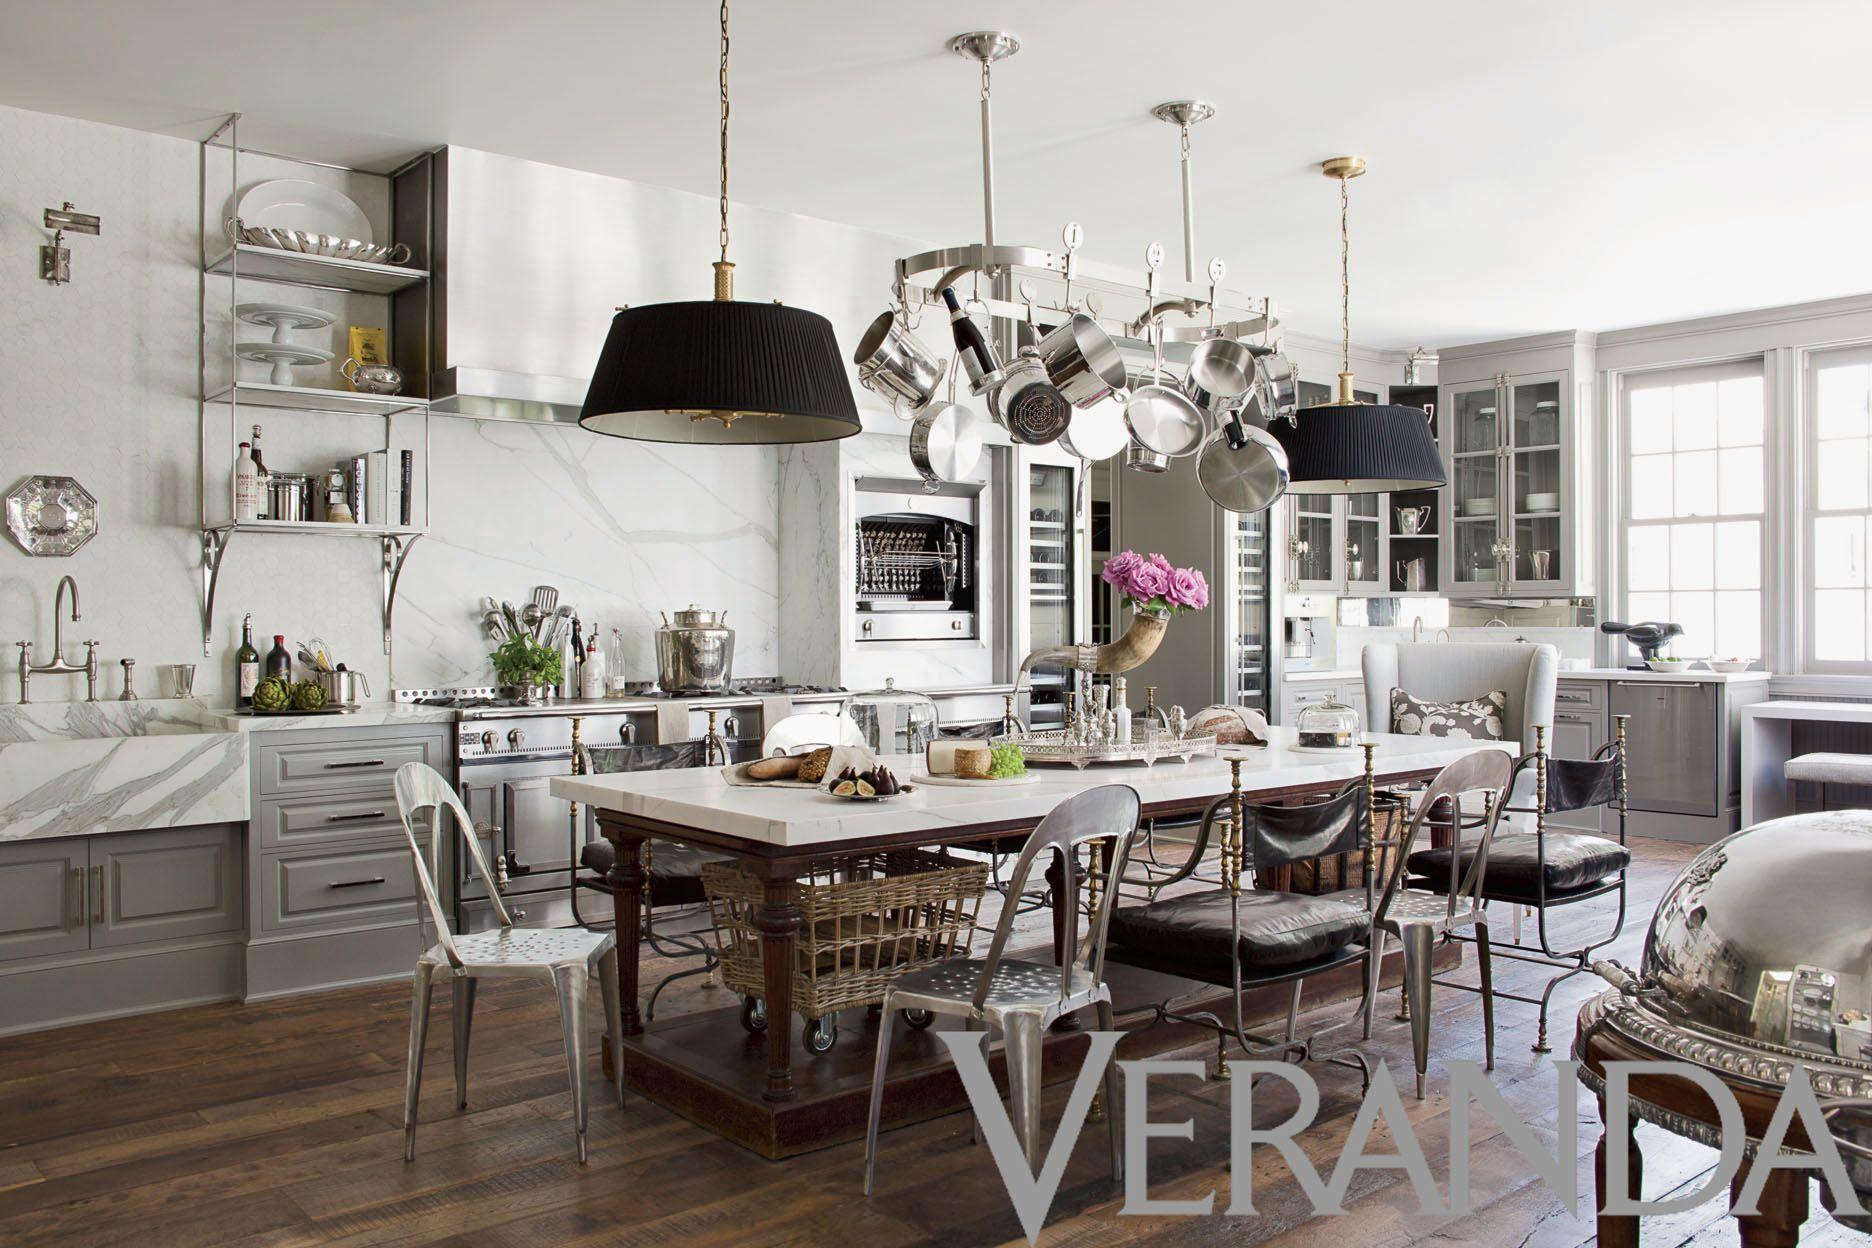 Pin by veranda magazine on kitchens in veranda pinterest for Interior decorating windsor